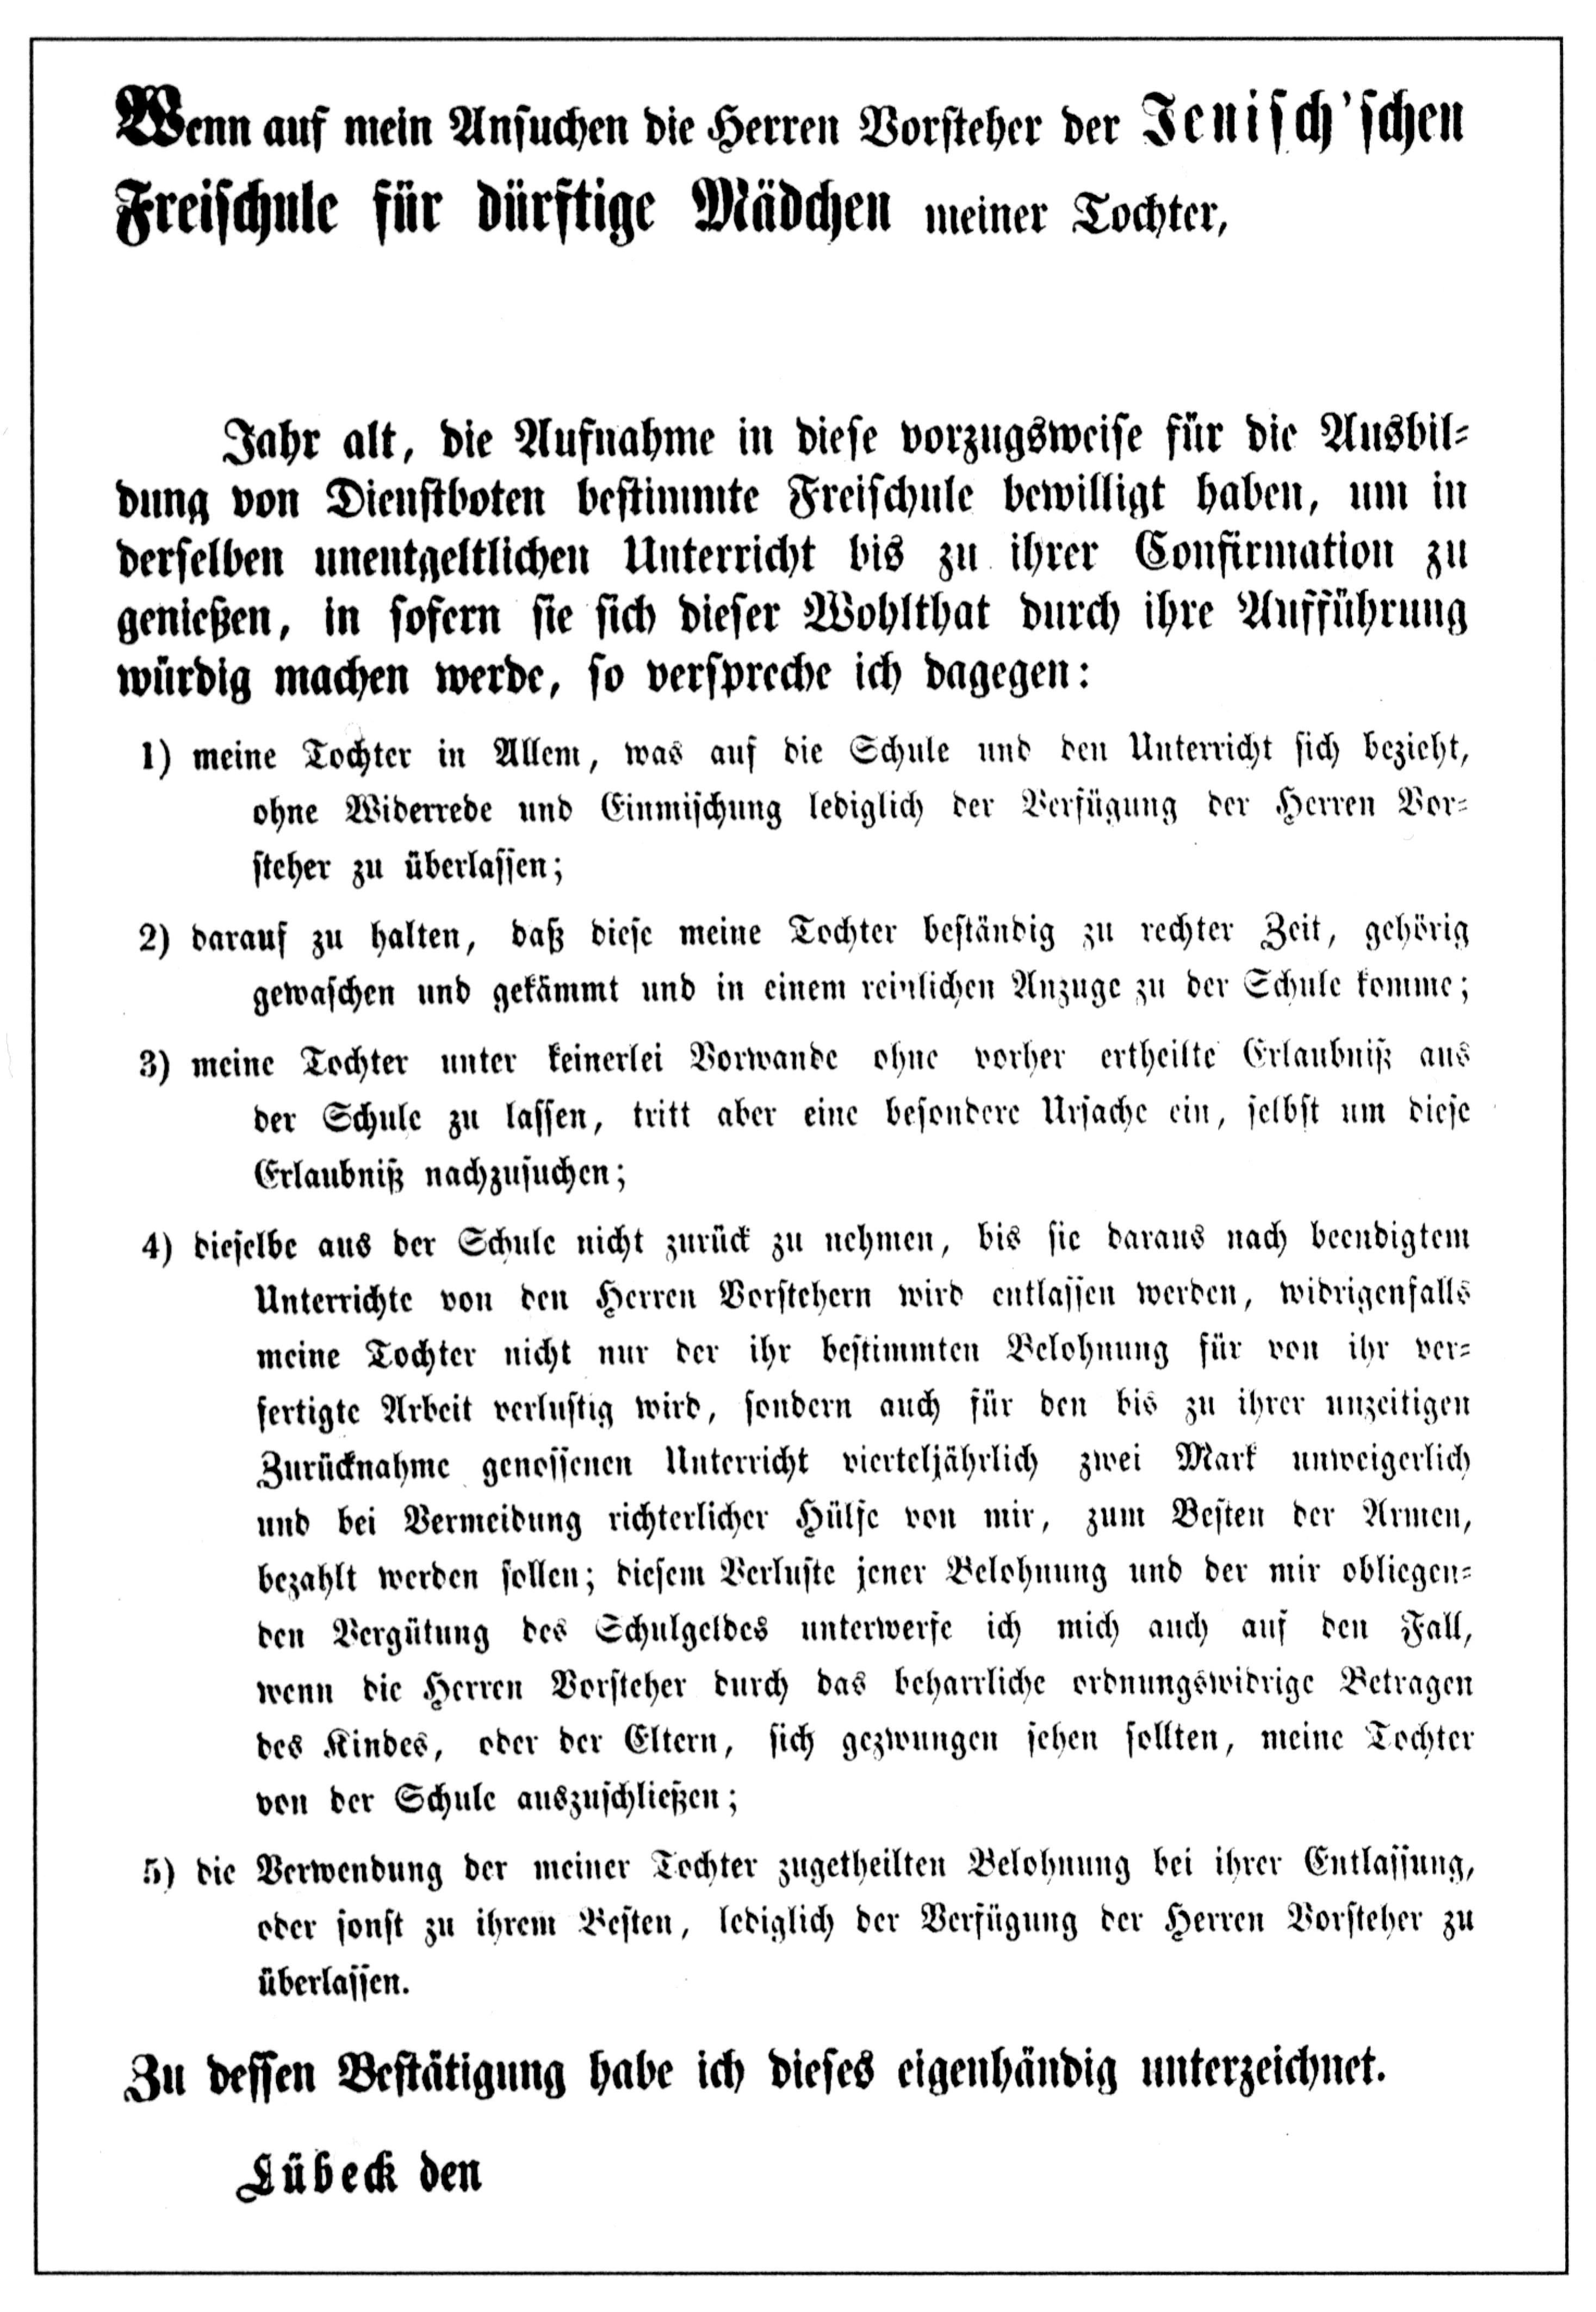 File:Aufnahmeformular Jenisch\'sche Freischule.jpg - Wikimedia Commons